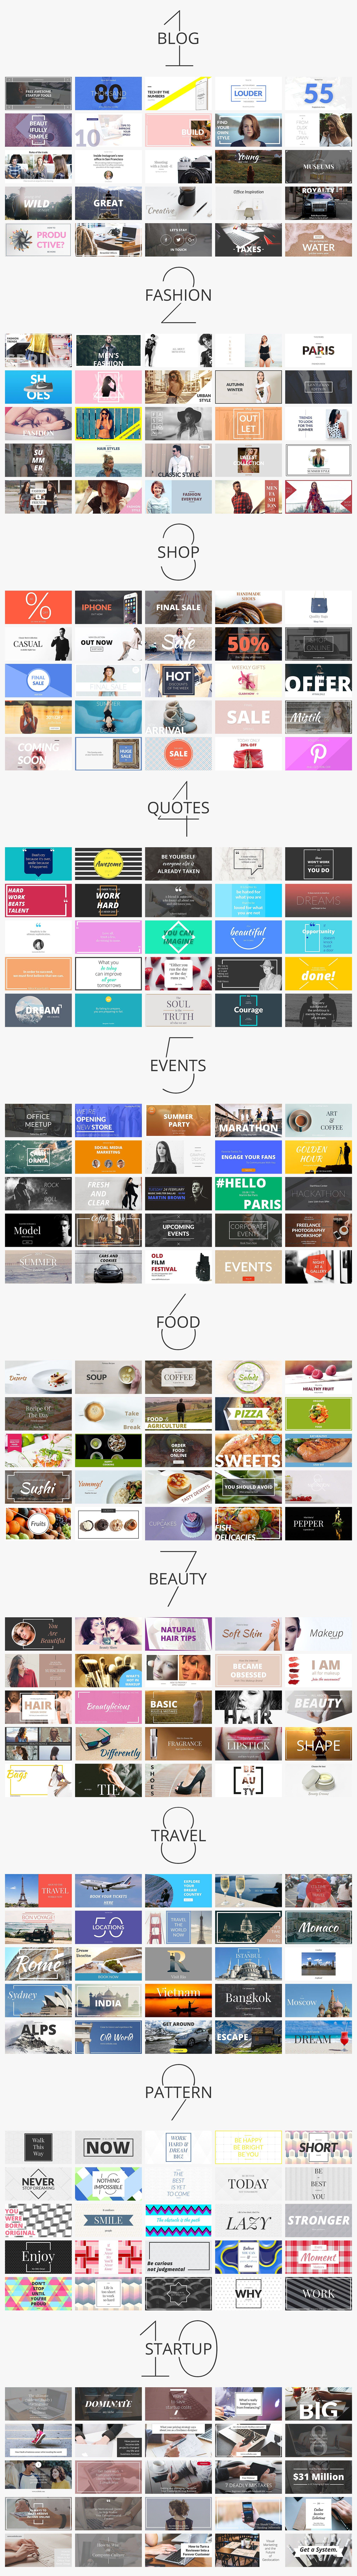 Massive Social Media Pack By Web Donut On At Creativemarket